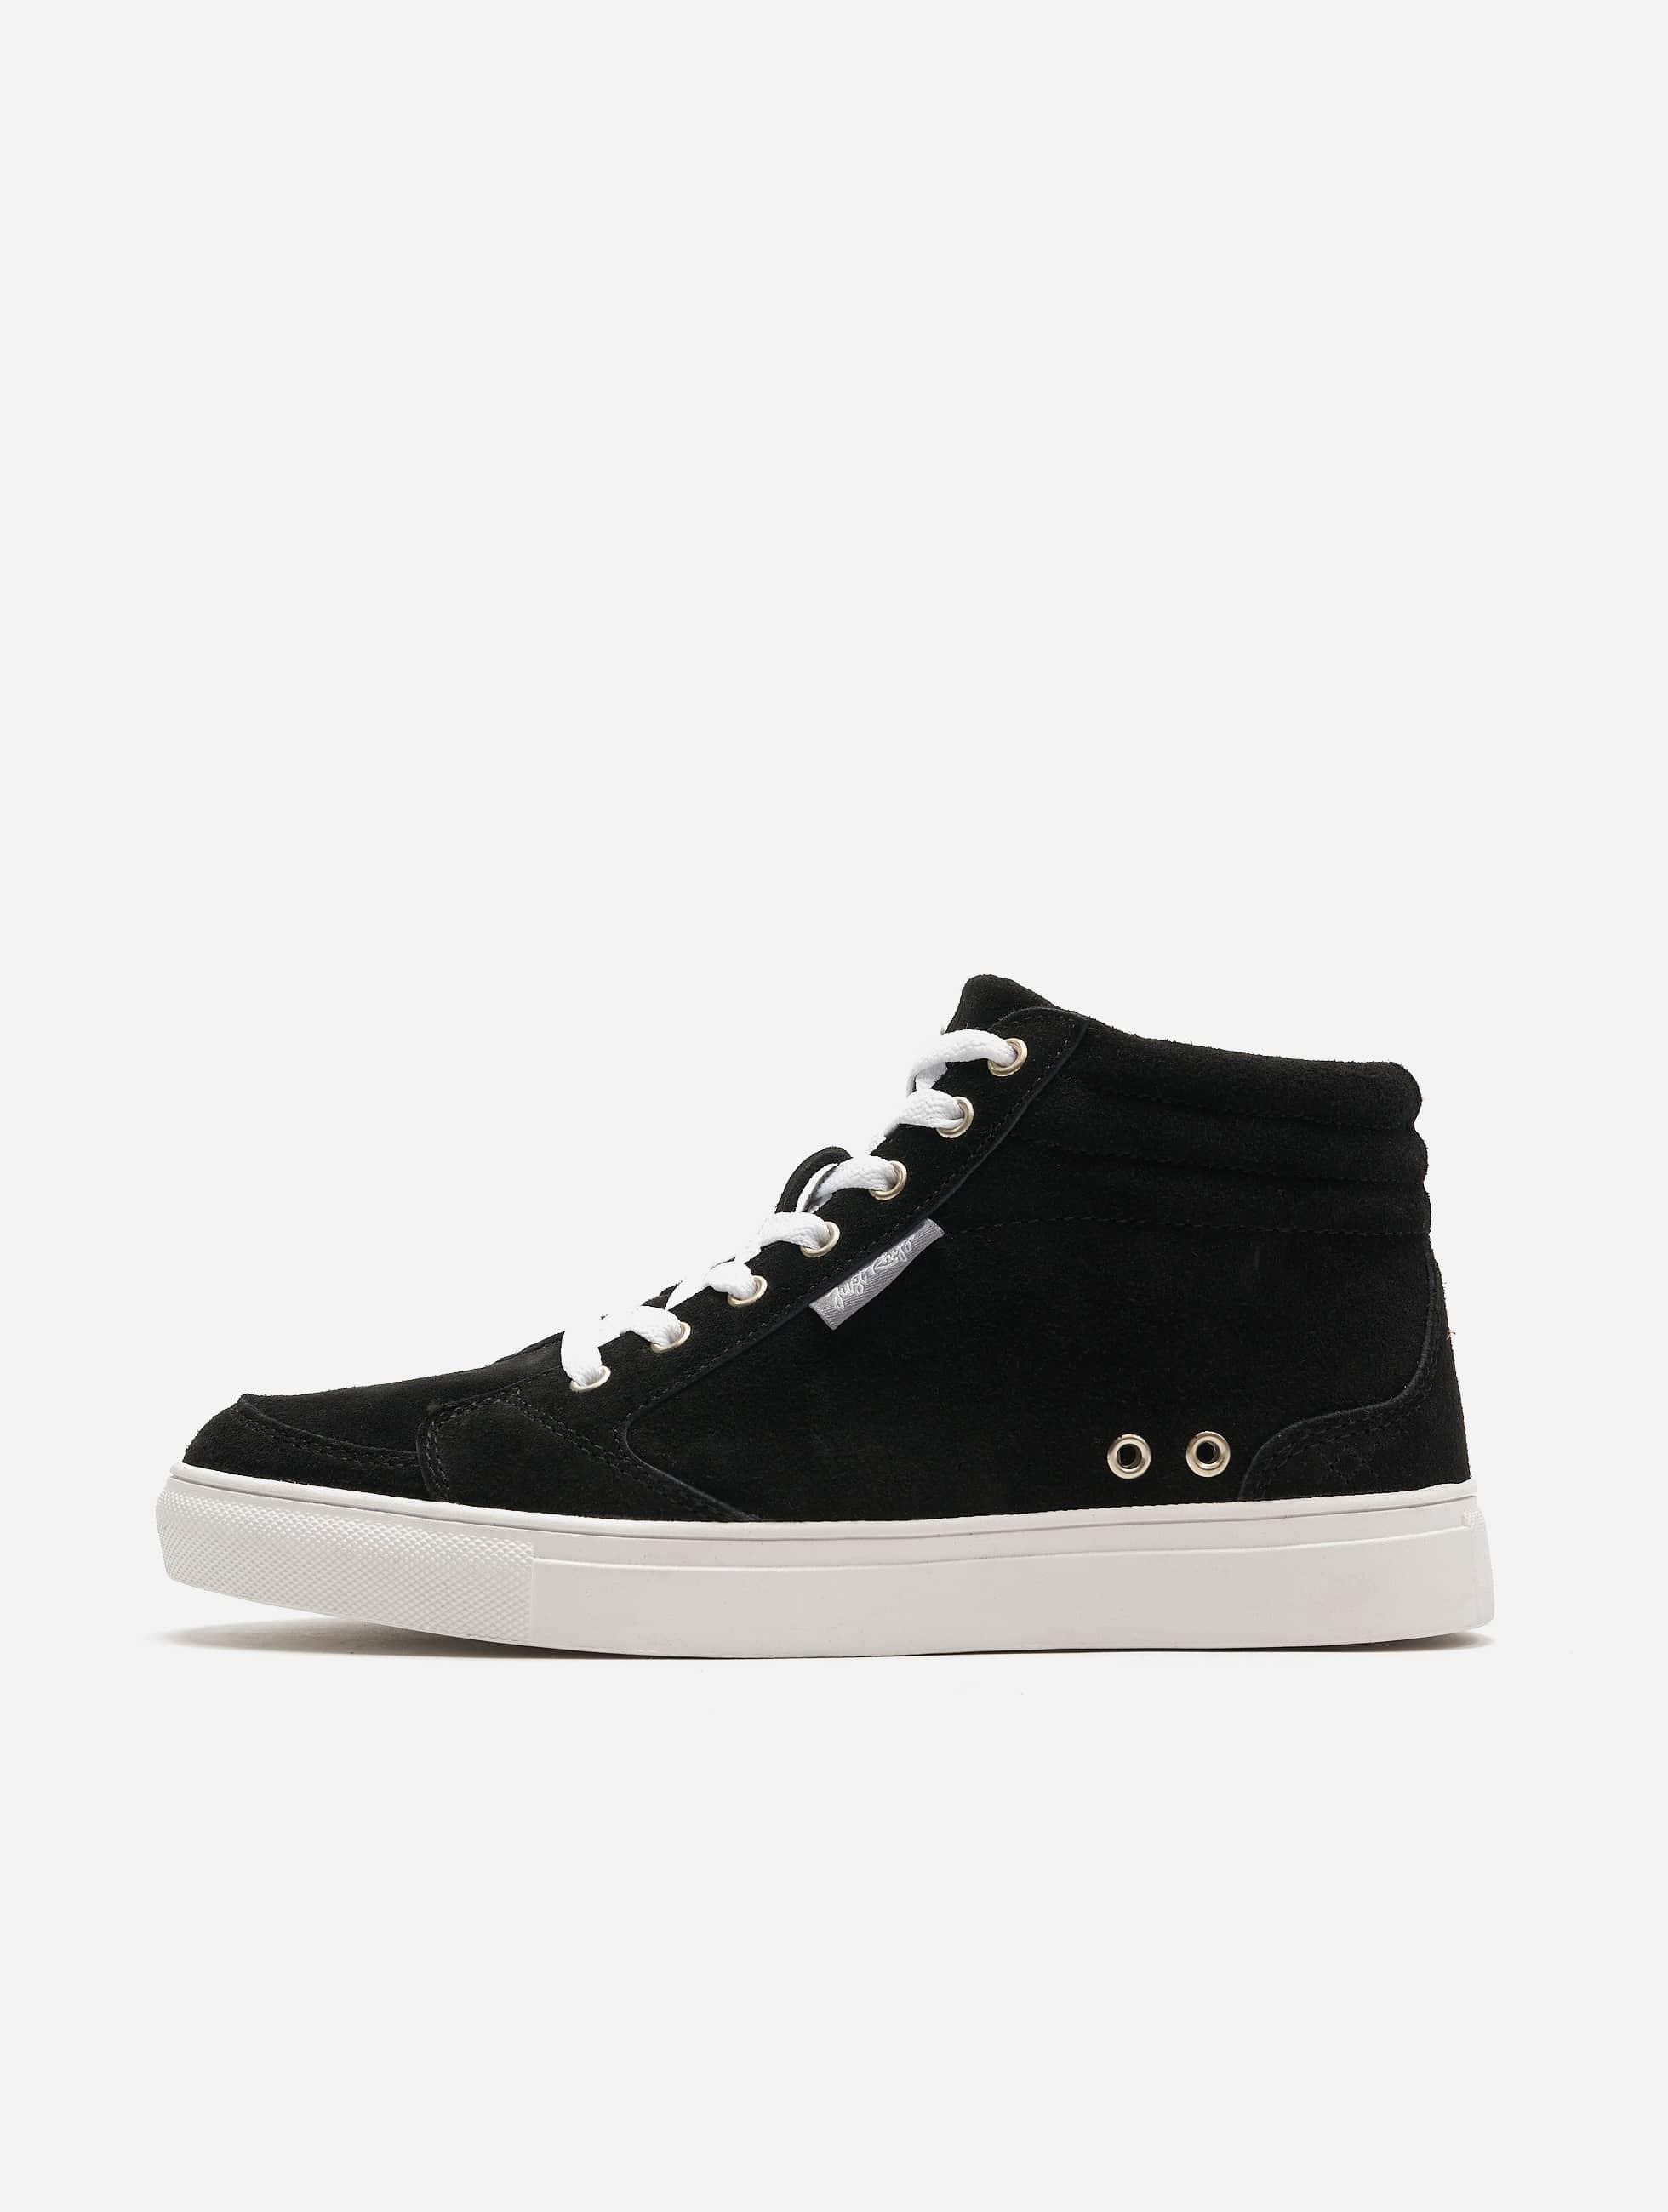 Just Rhyse / Sneakers Ghettostars in black 40